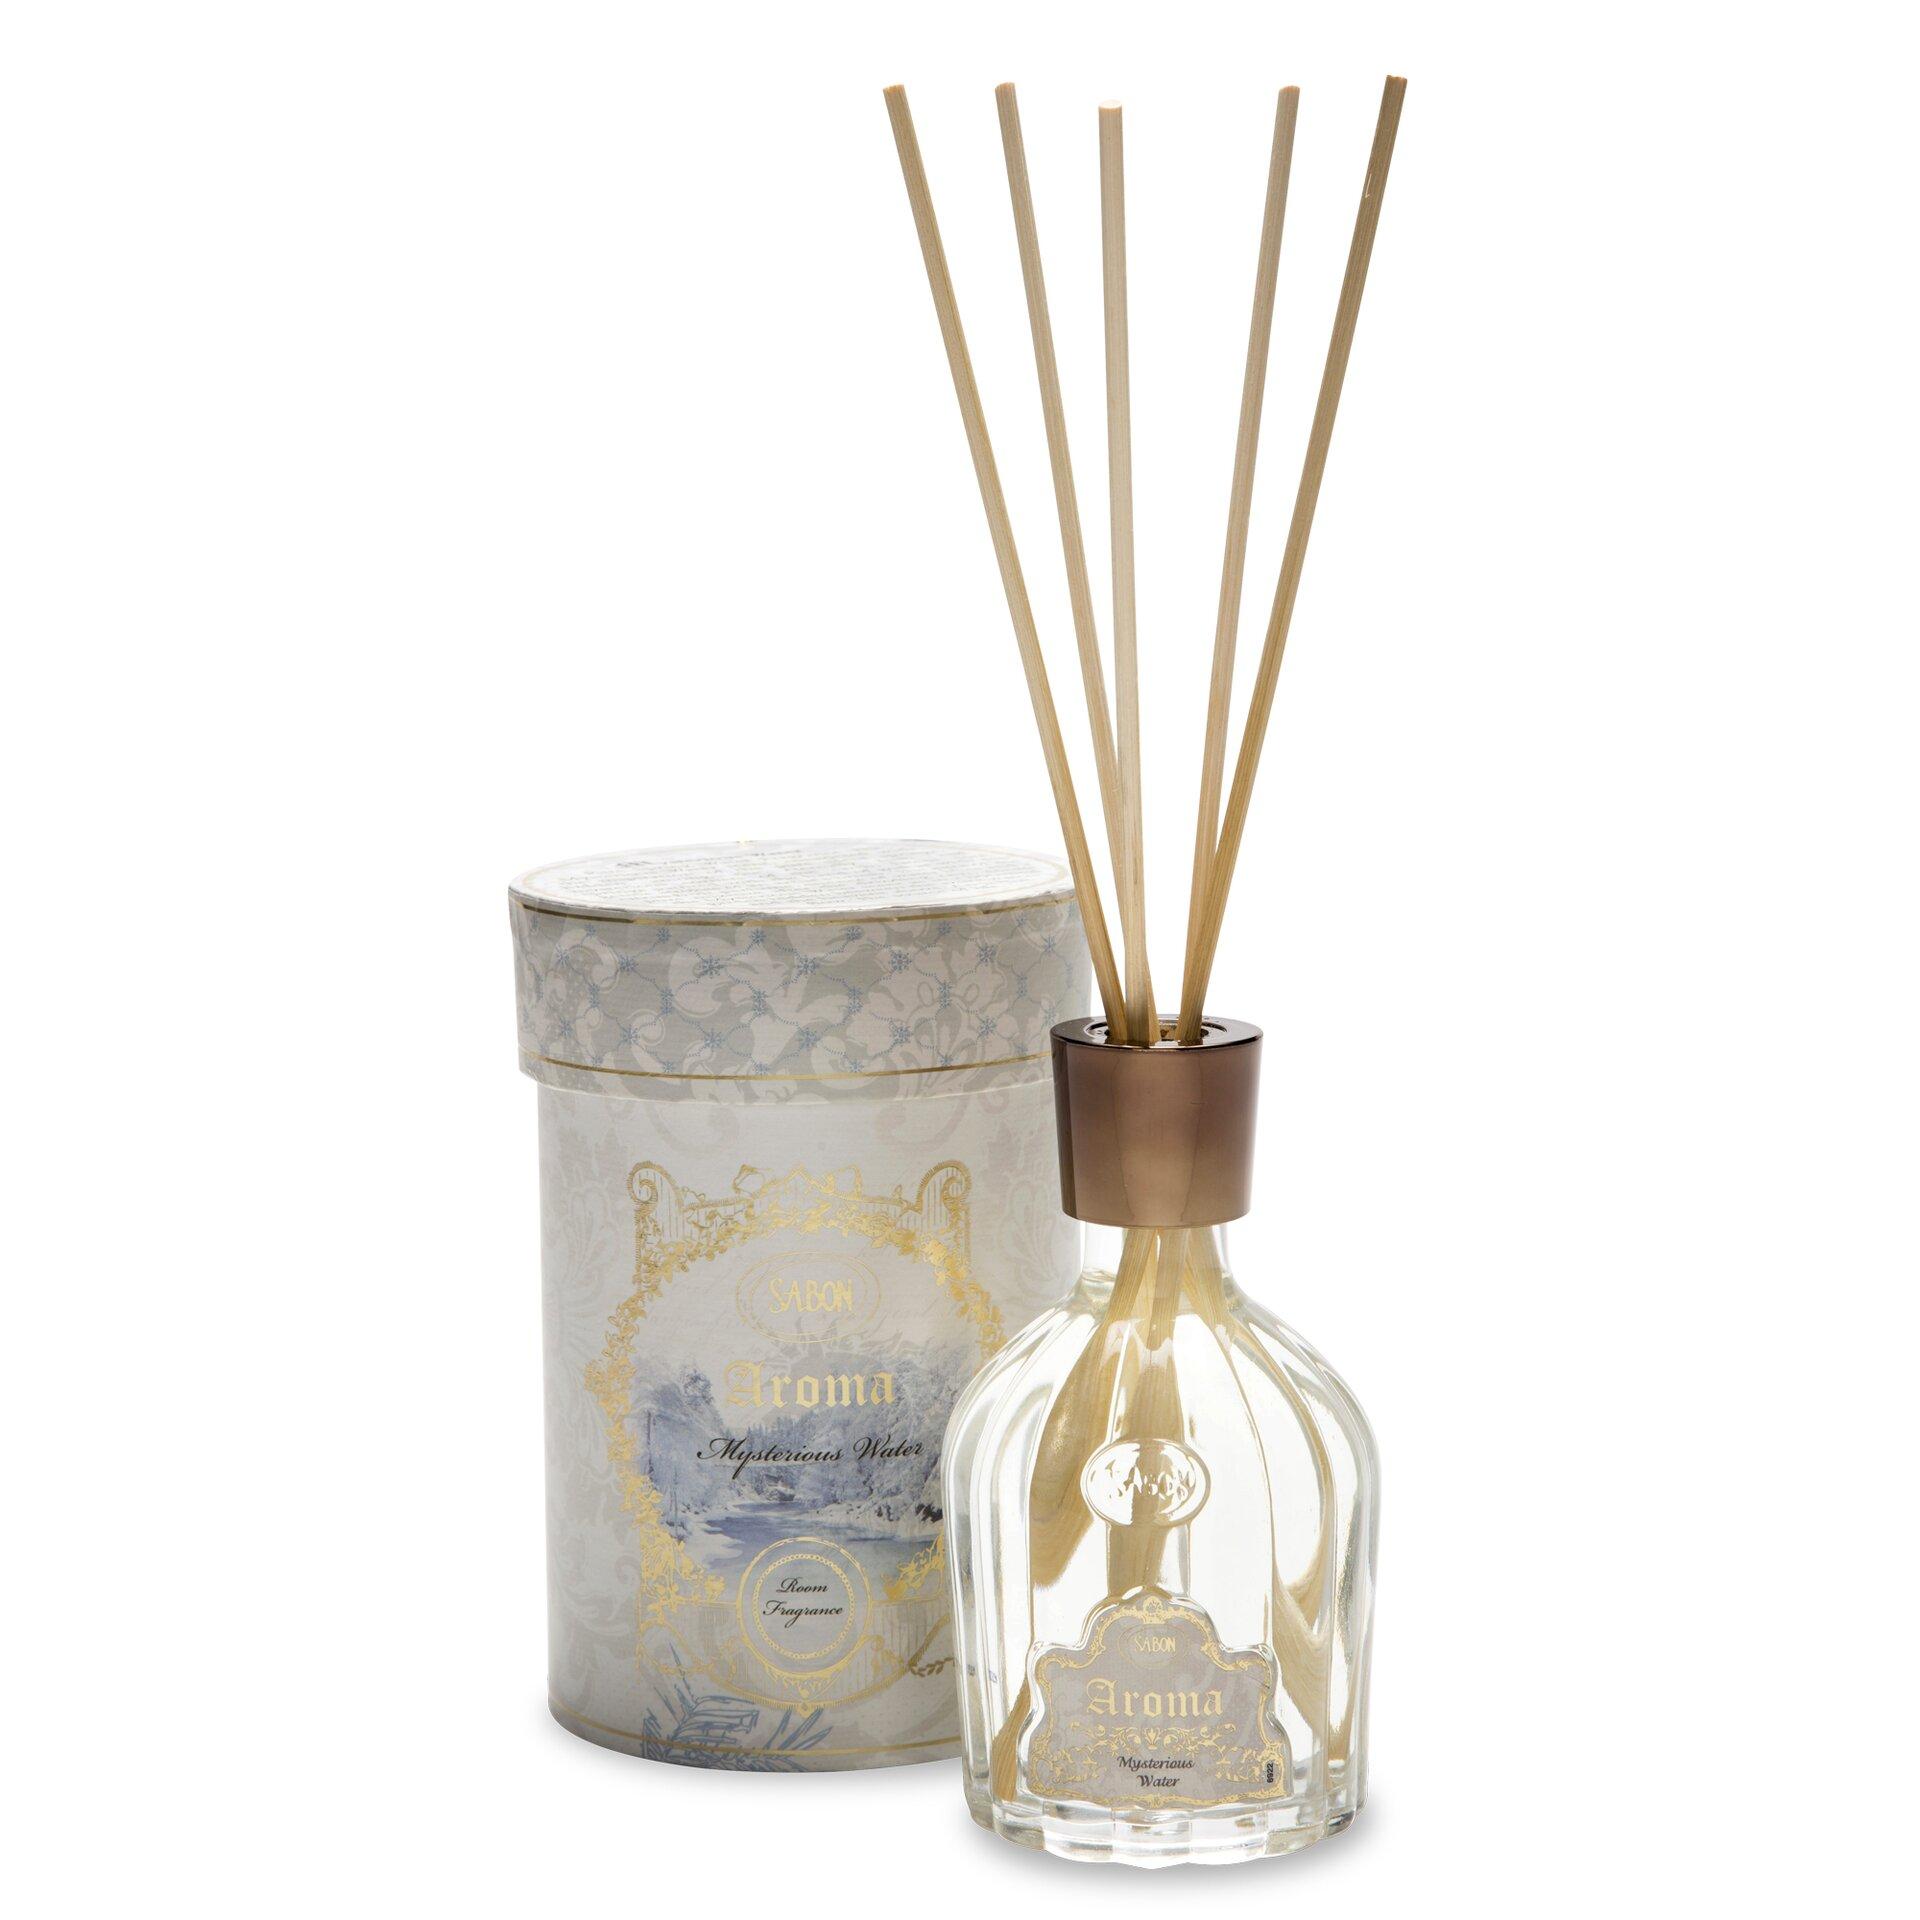 Aromă Royal Mysterious Water sabon.ro